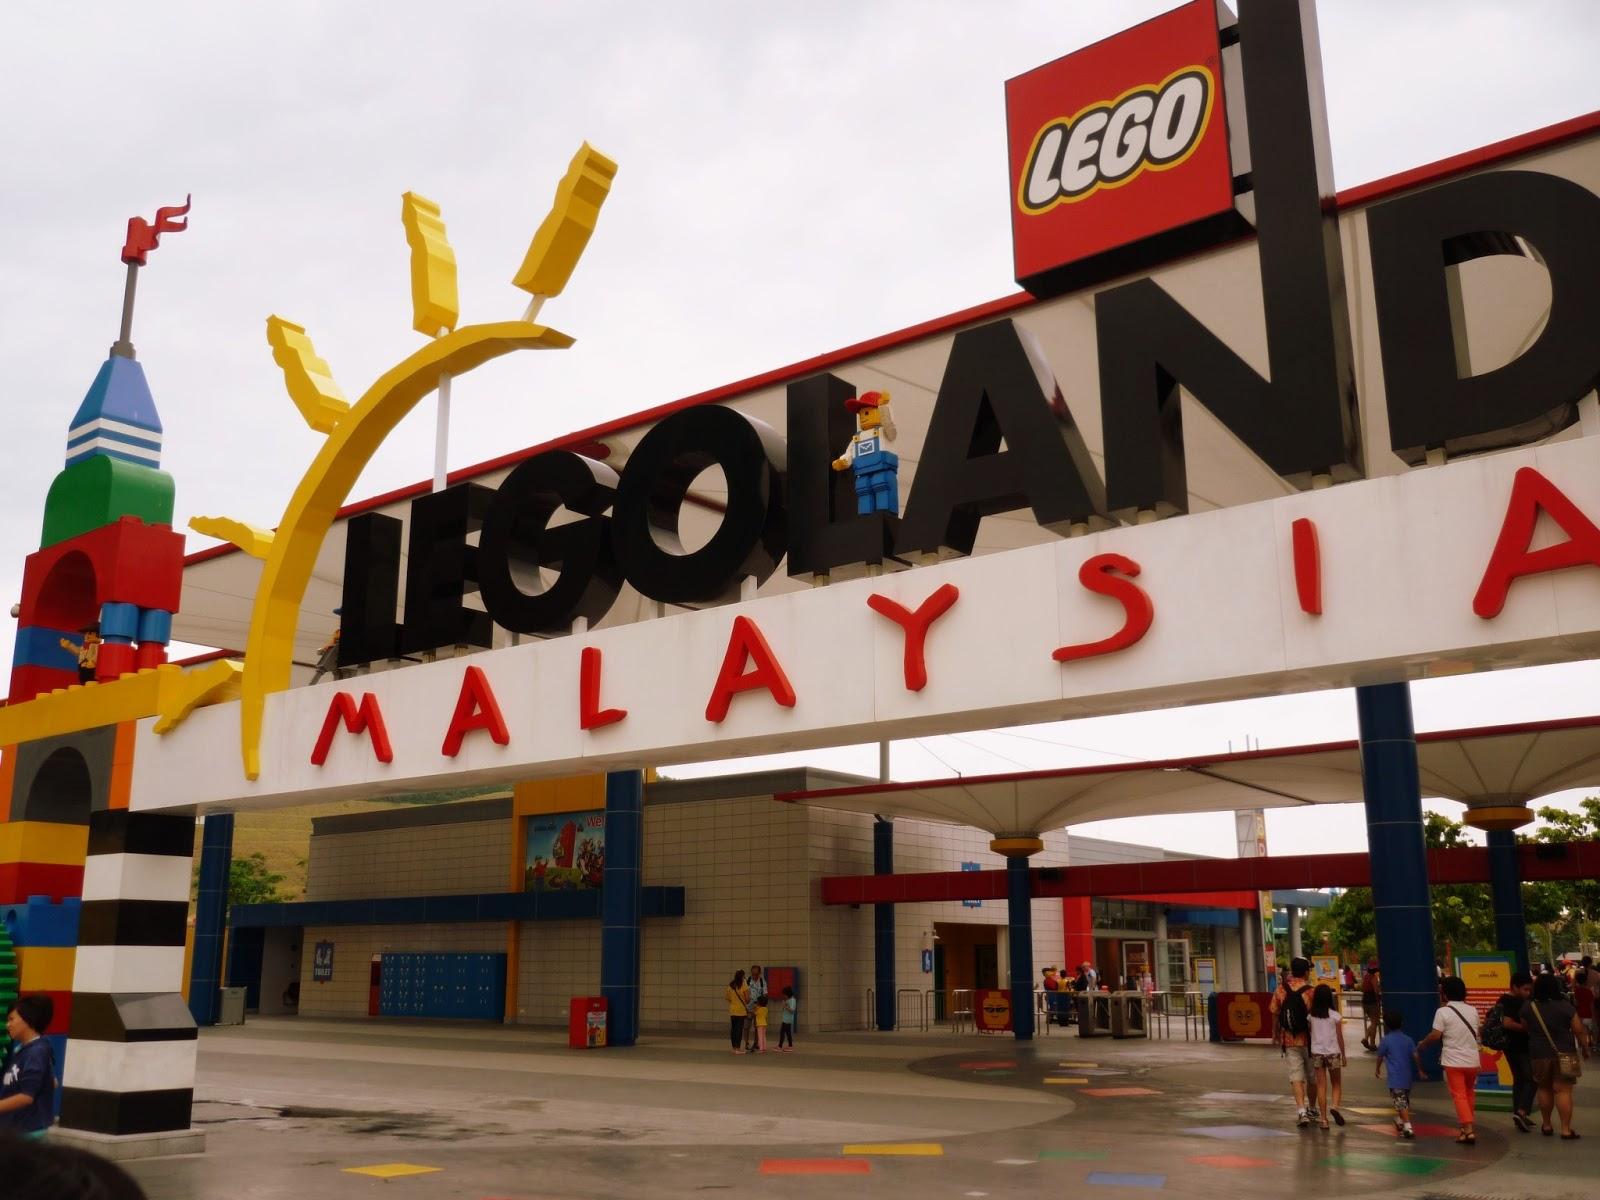 Aikialo: by KTM train Singapore-Kulai and to Legoland Malaysia